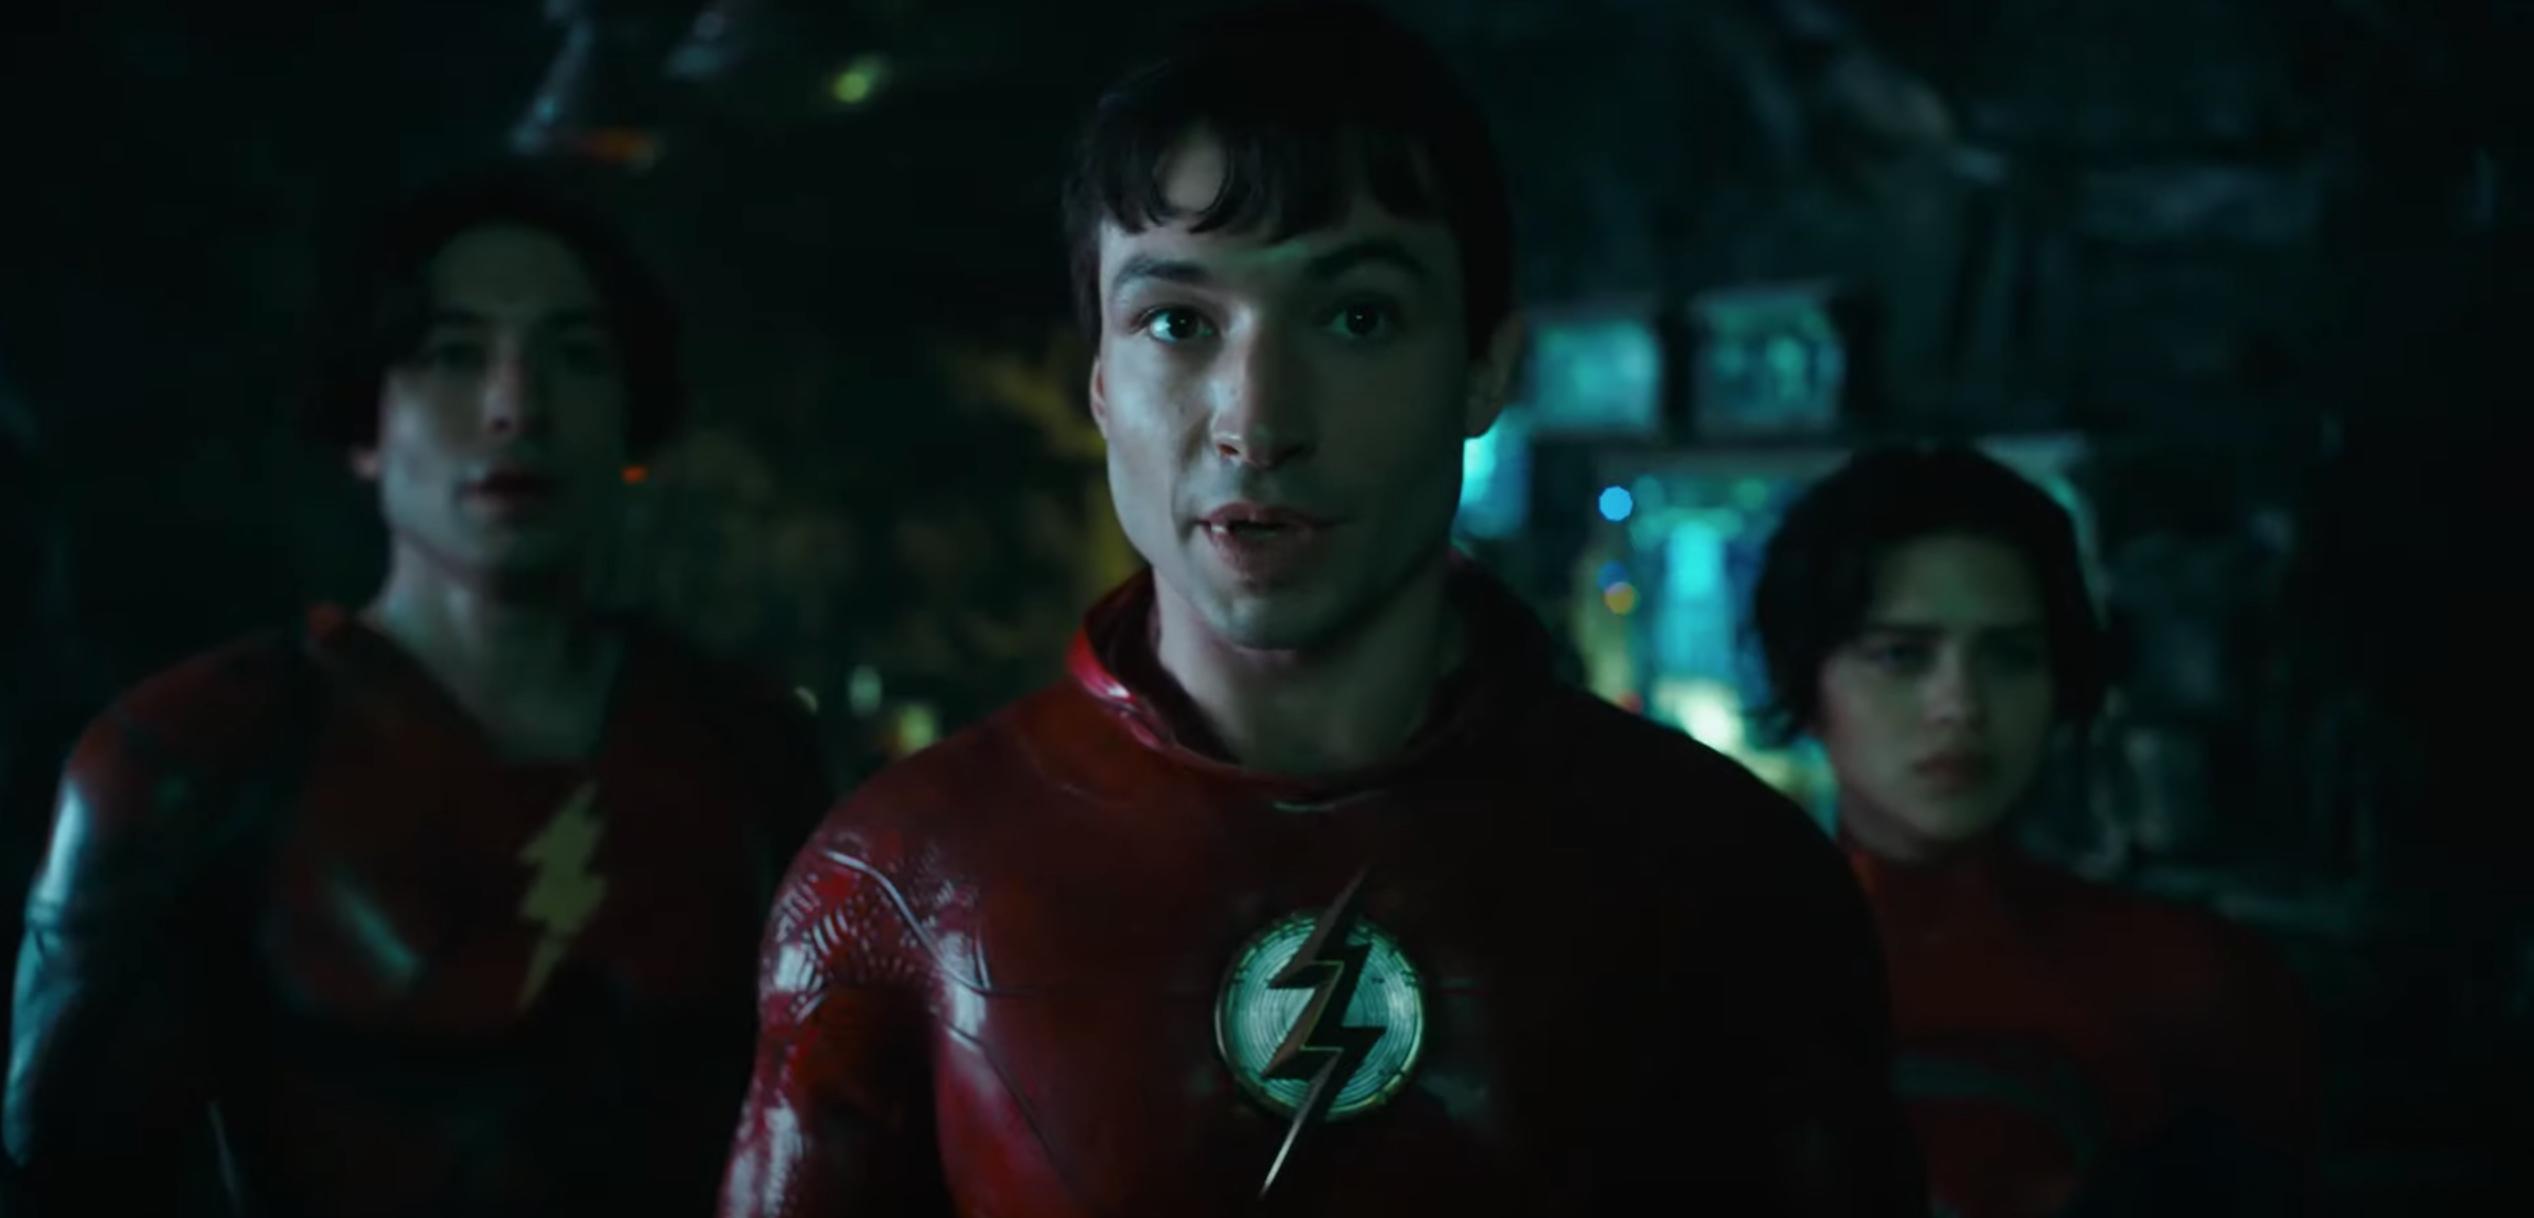 'The Flash' Movie Teaser: Multiple Ezra Millers Meet Michael Keaton's Batman